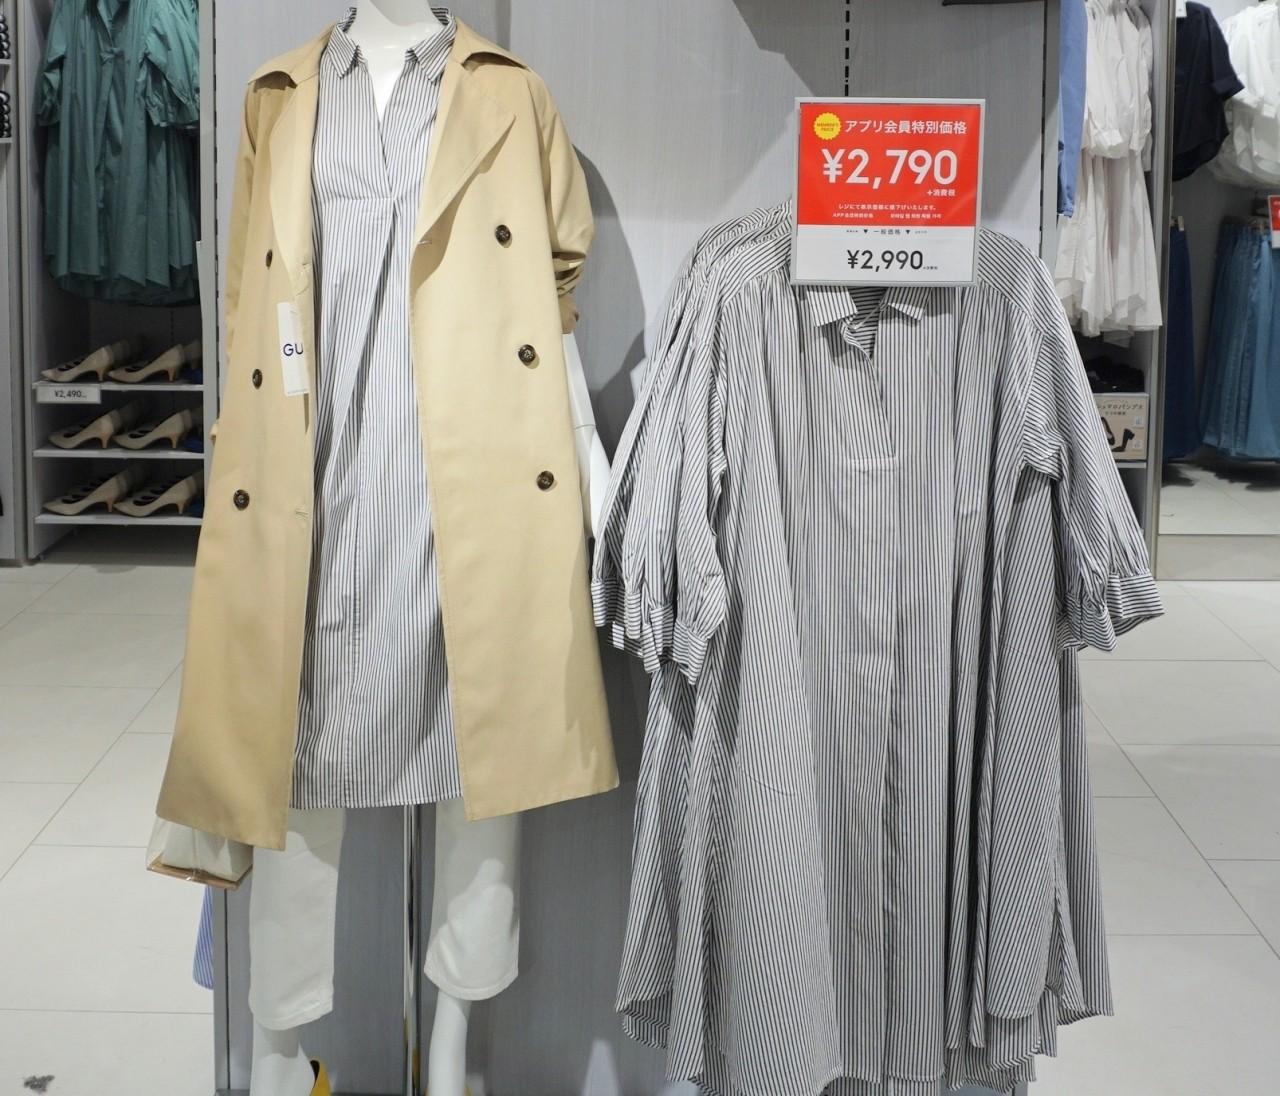 【GU(ジーユー)】渋谷店で30代女子に人気の通勤服&バッグ&シューズ12選